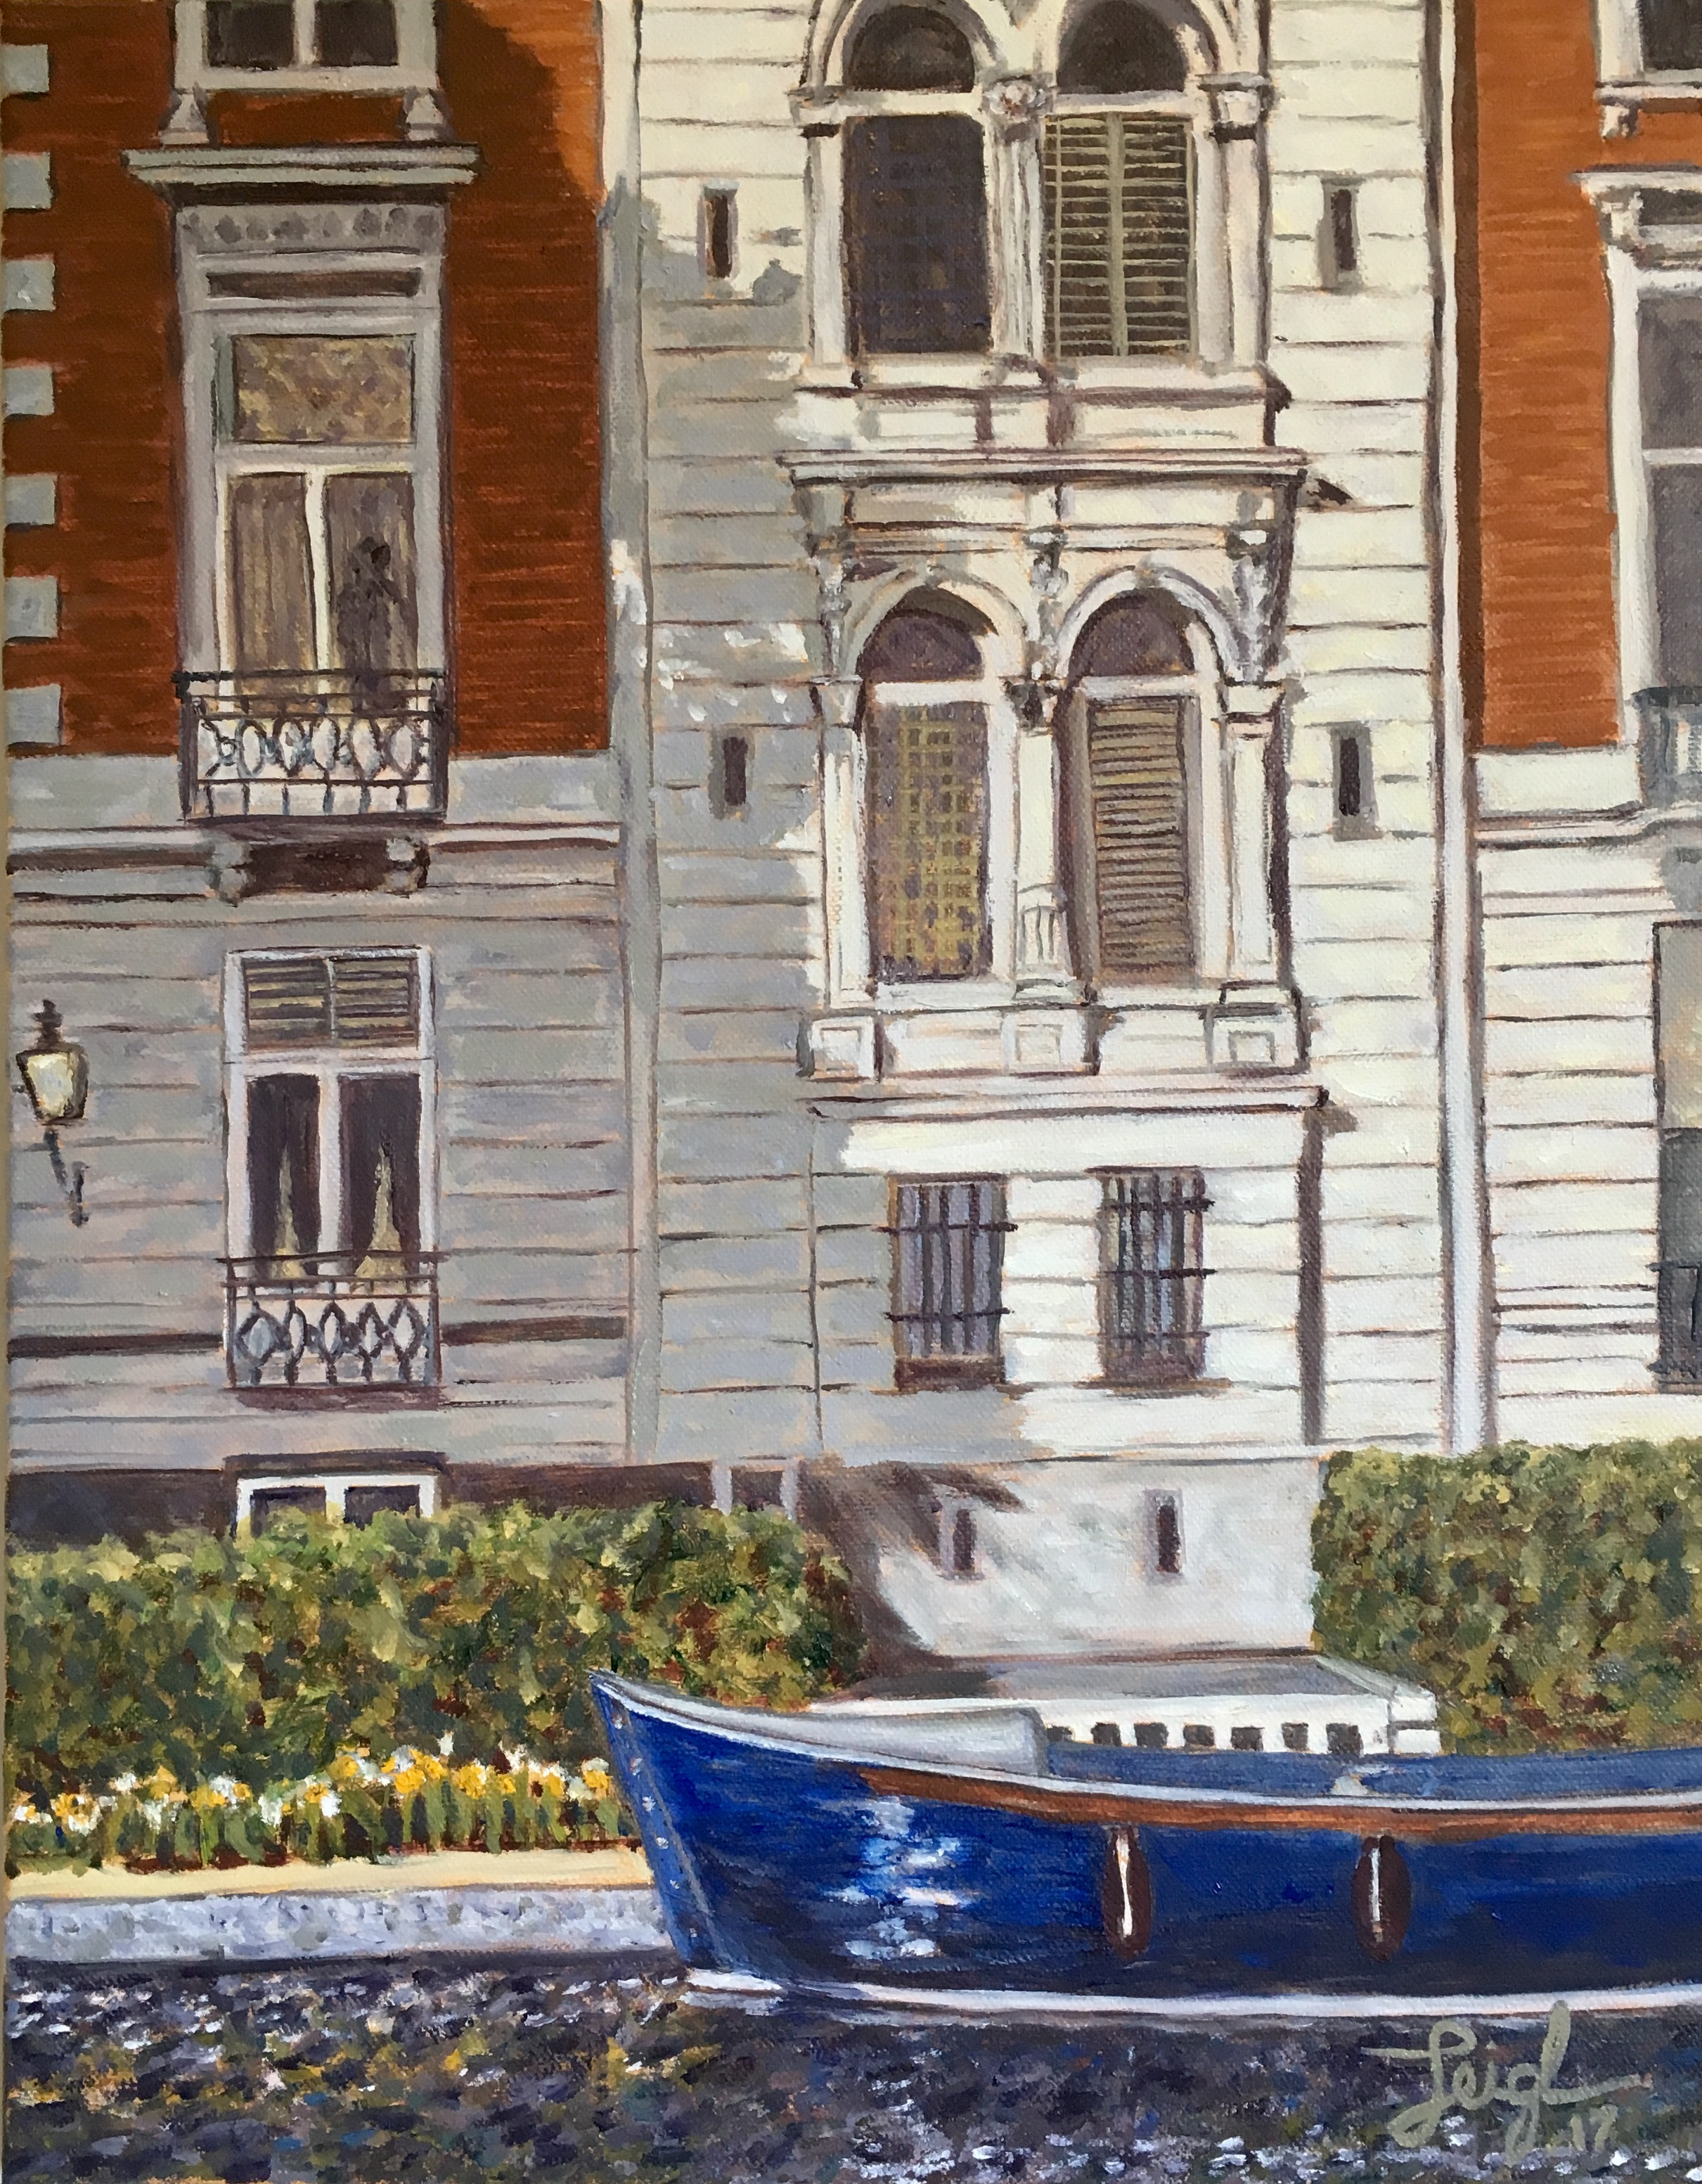 Amsterdam Blue Boat  ~  Sage Schaan, San Francisco, CA 2017  •  14 x 18